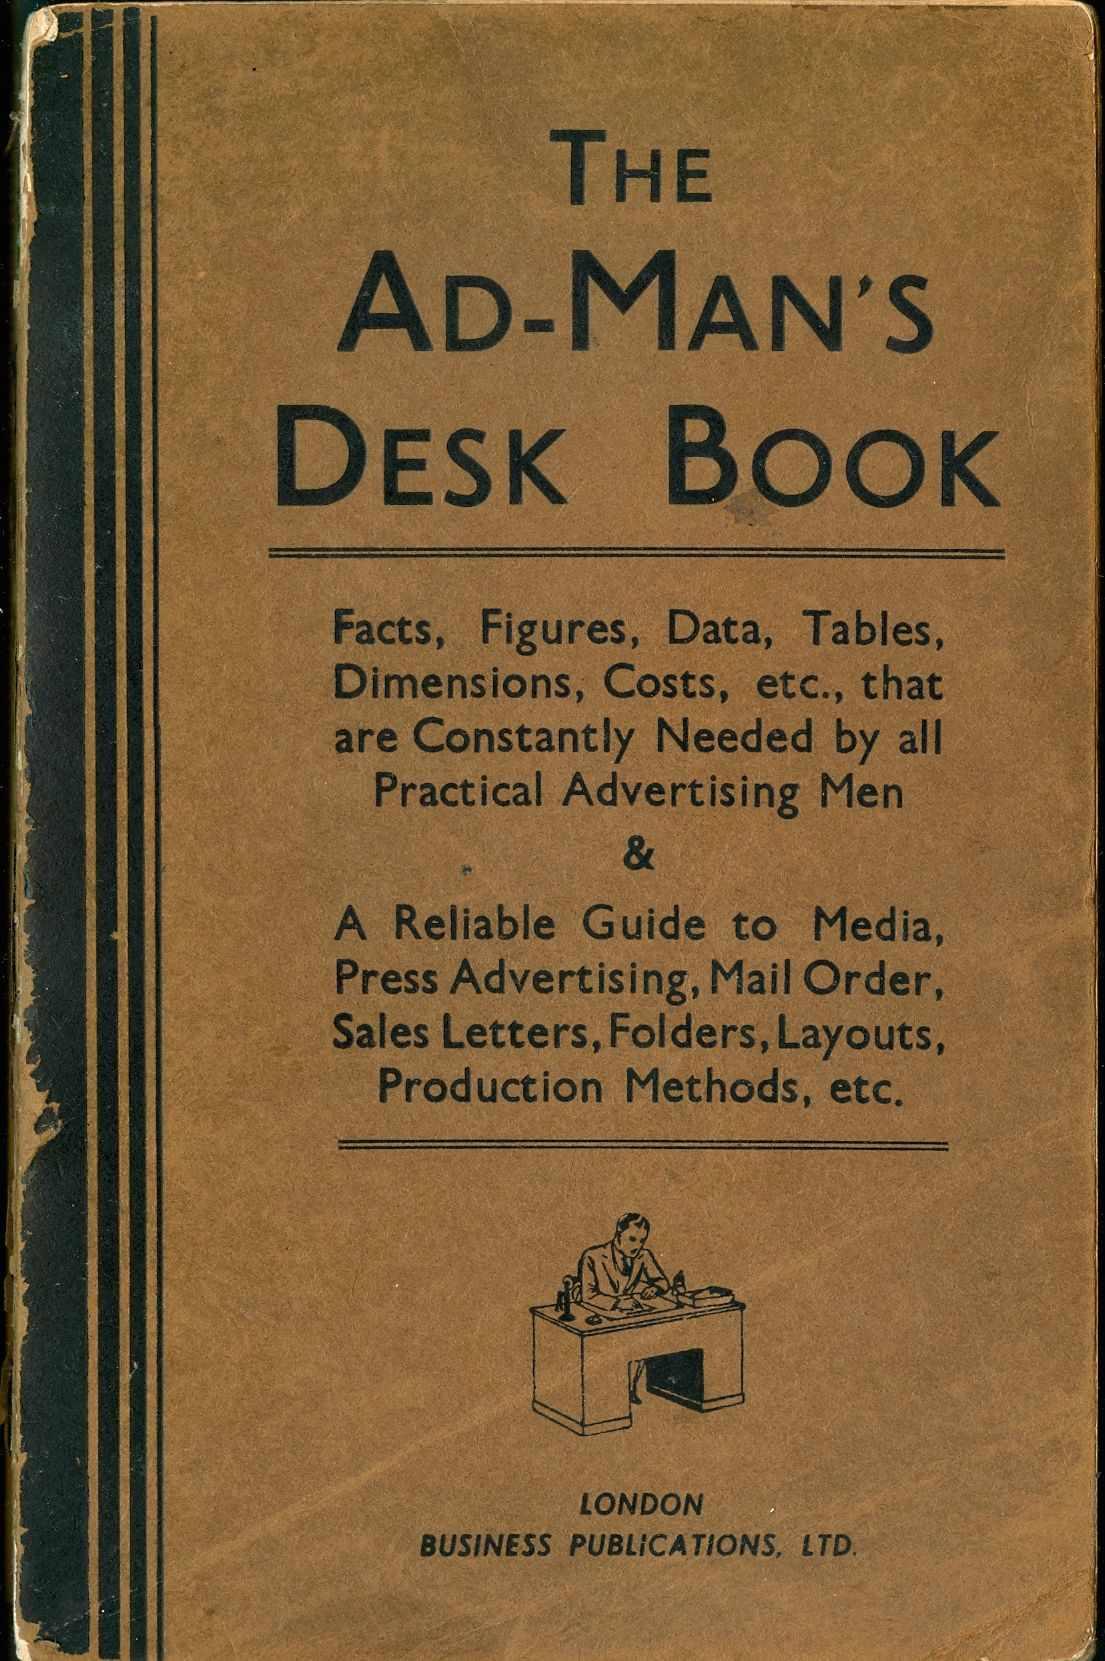 the-ad-mans-desk-book-1